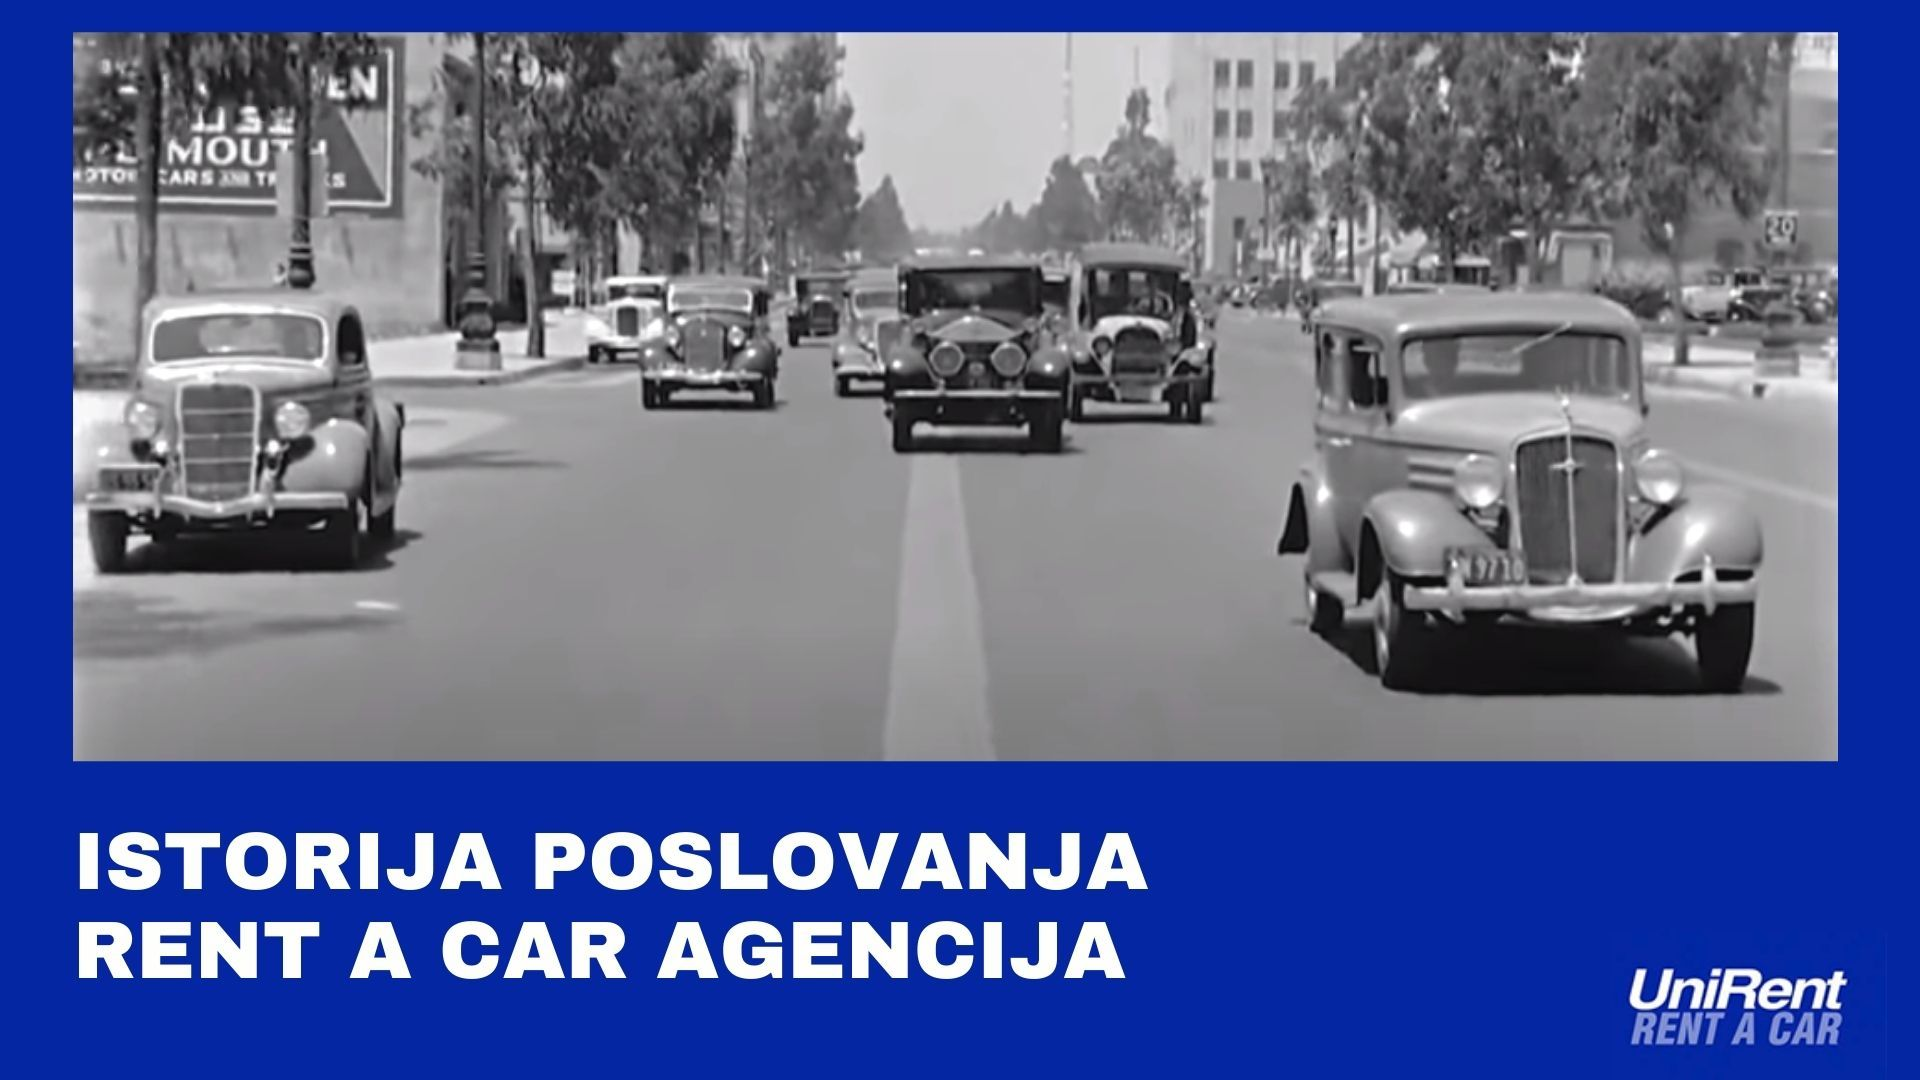 Istorija poslovanja rent a car agencija